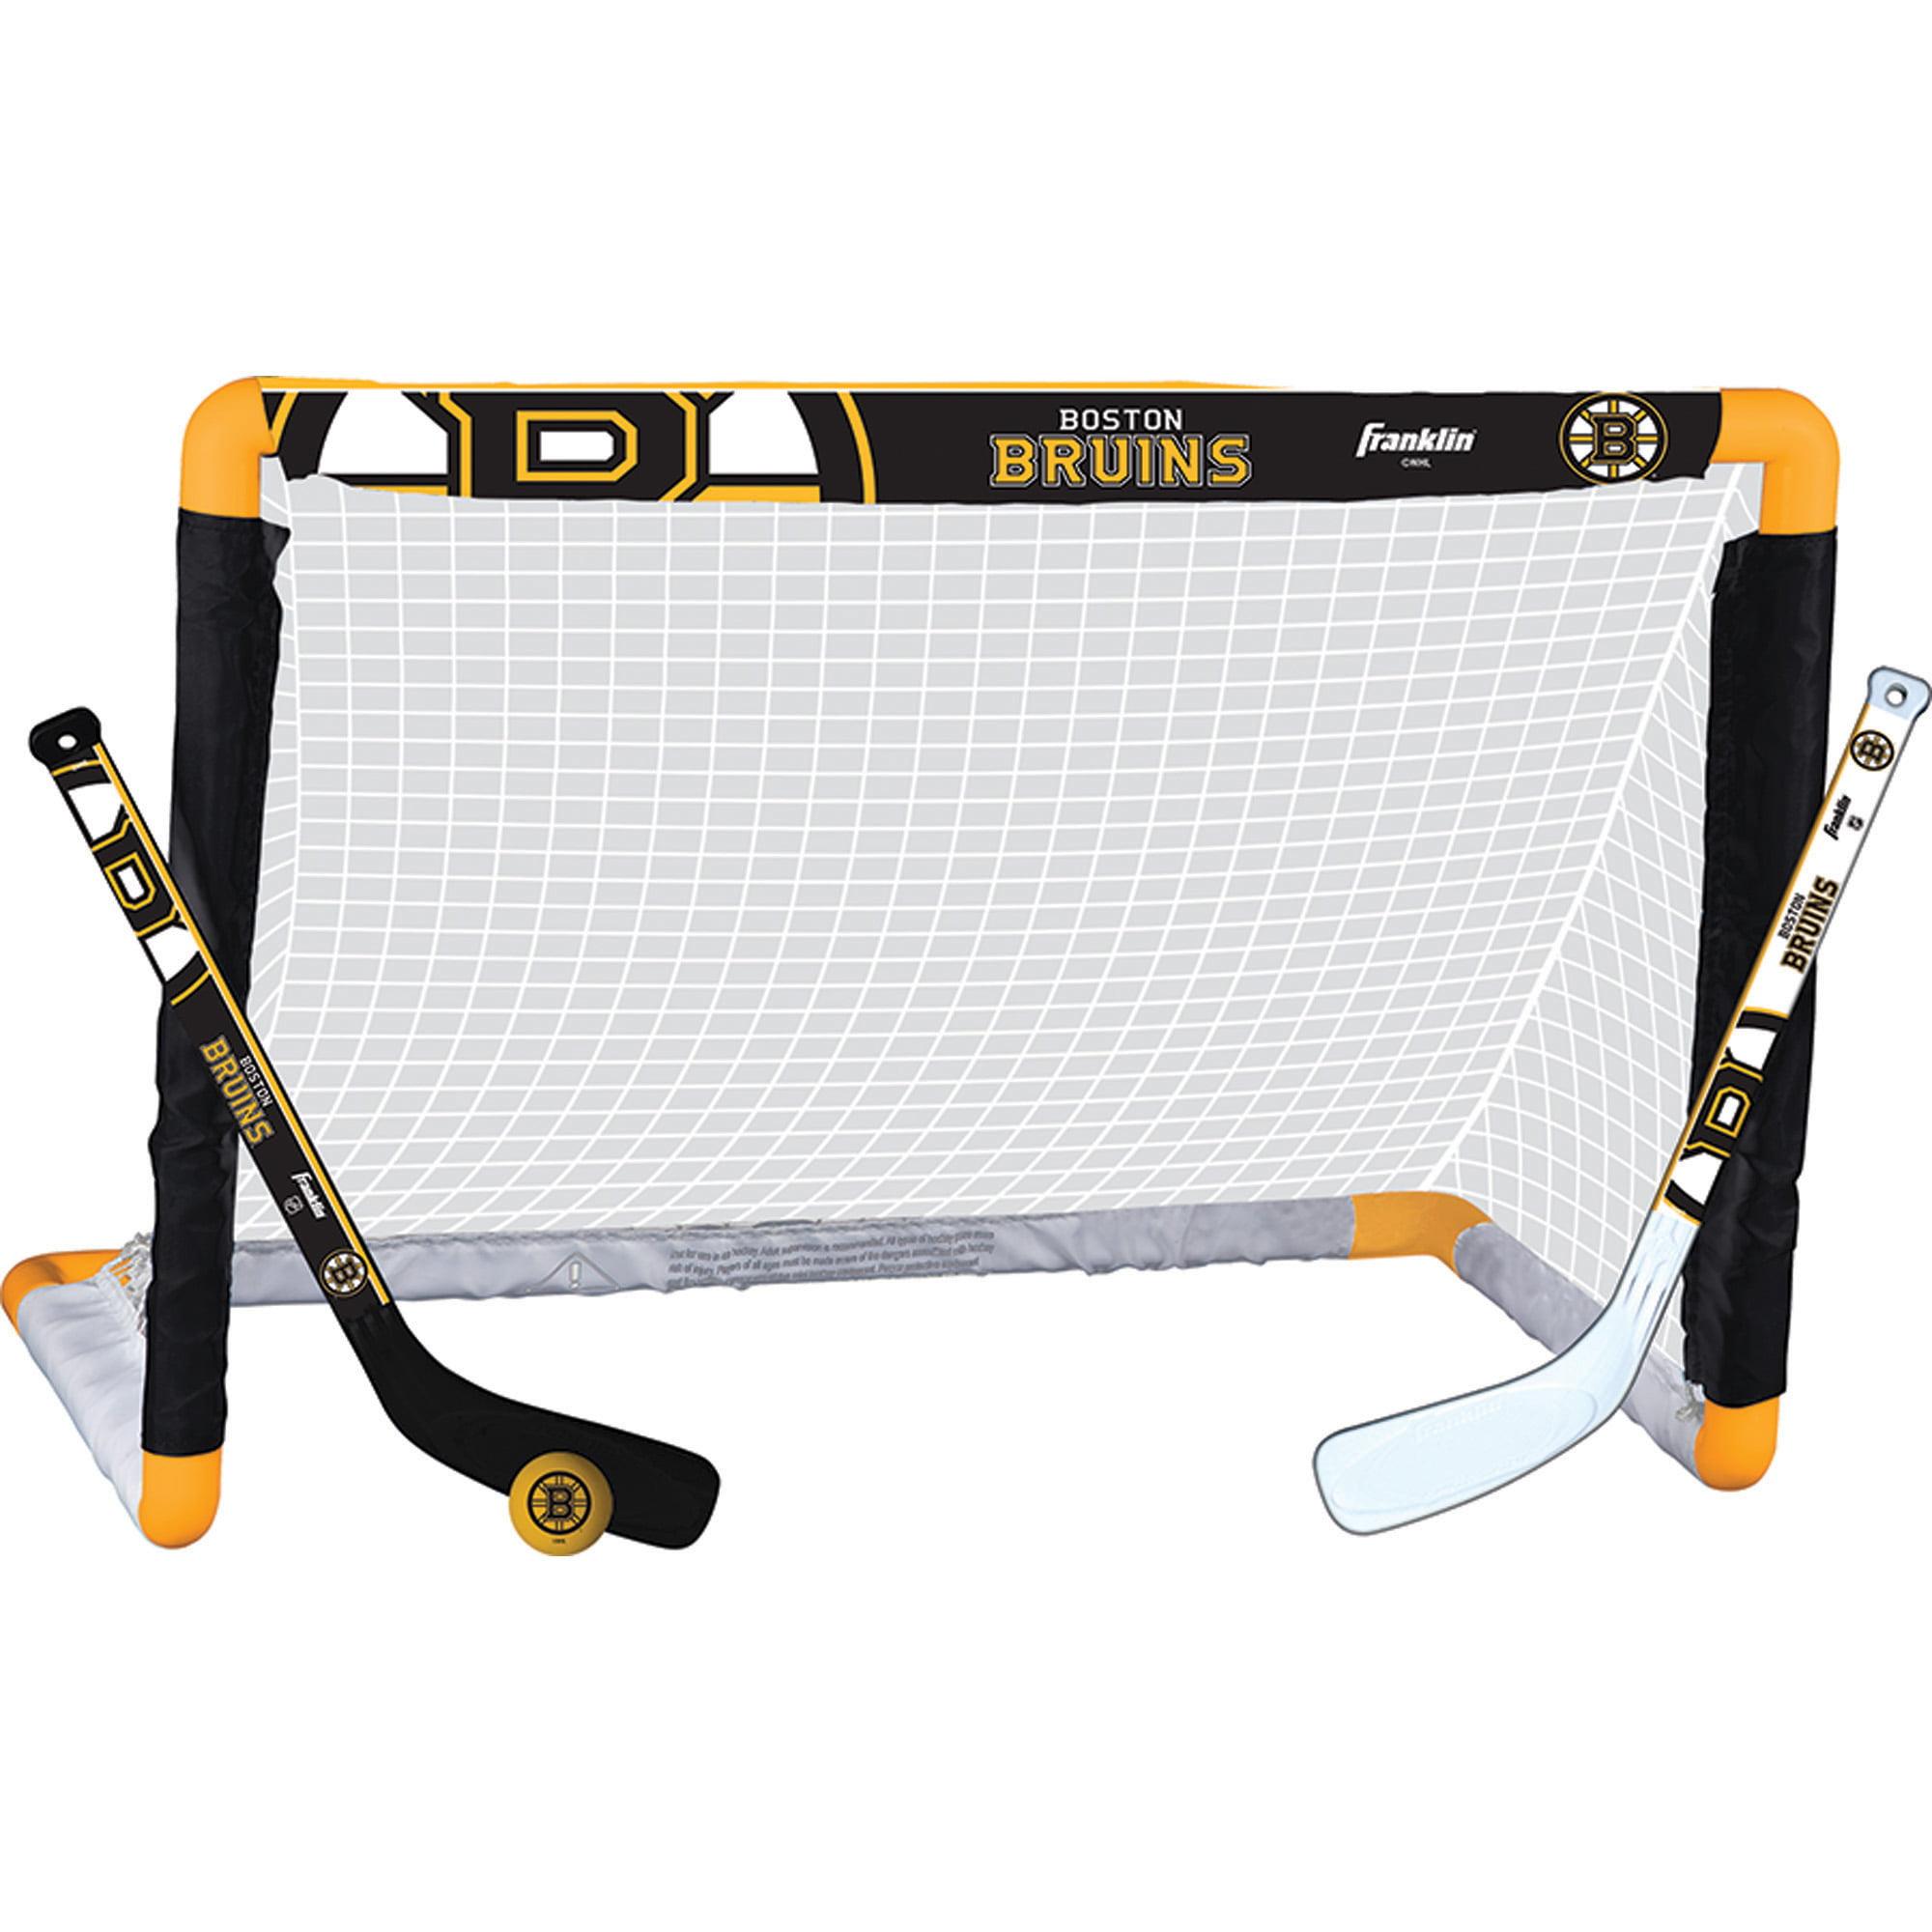 Franklin Nhl Mini Hockey Goal Set Bruins Walmart Com Walmart Com